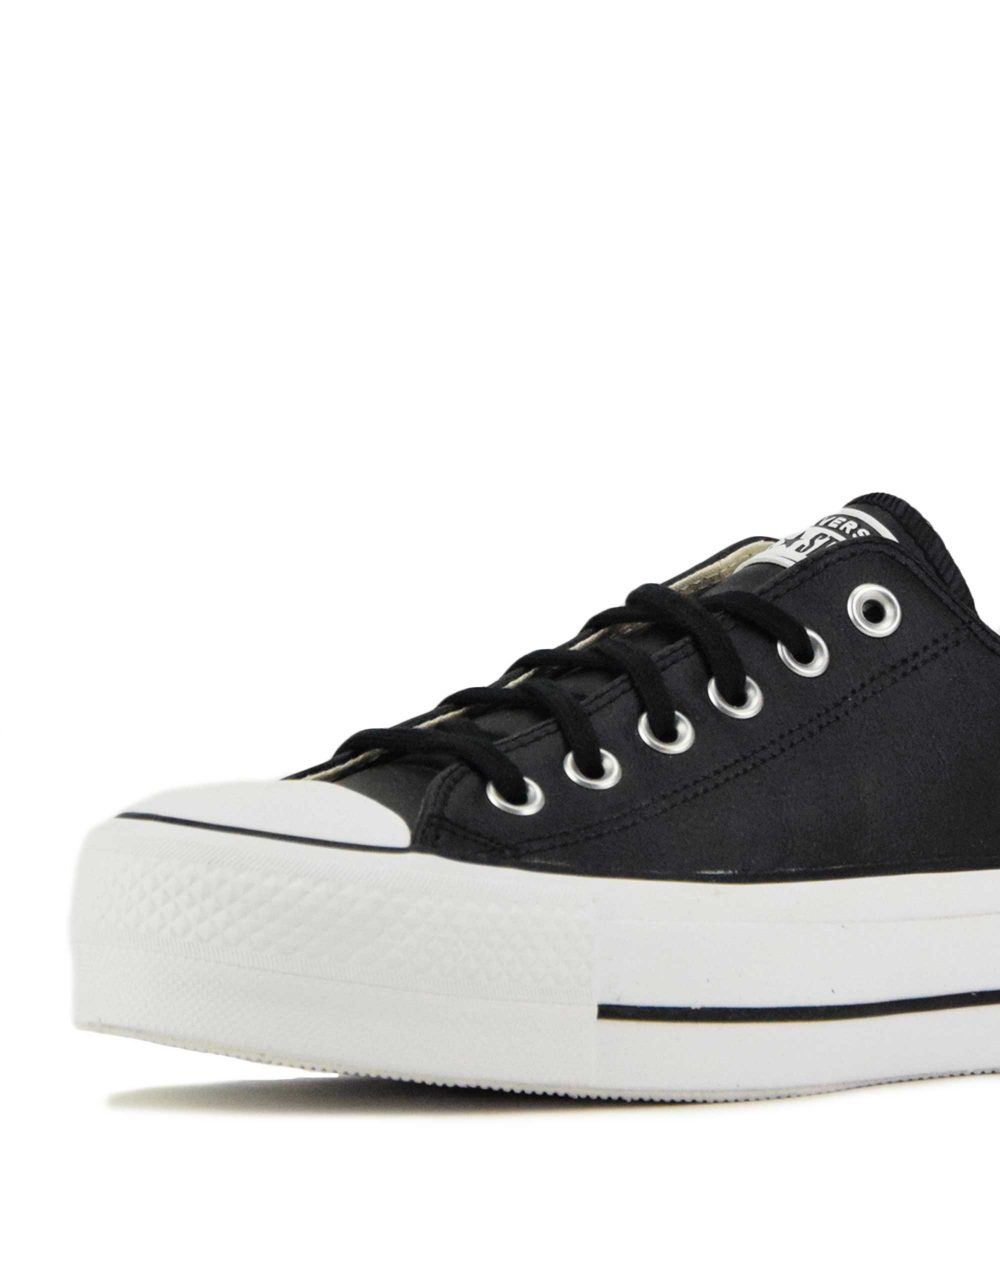 Converse Chuck Taylor All Star Lift Clean OX (561681) Black/White